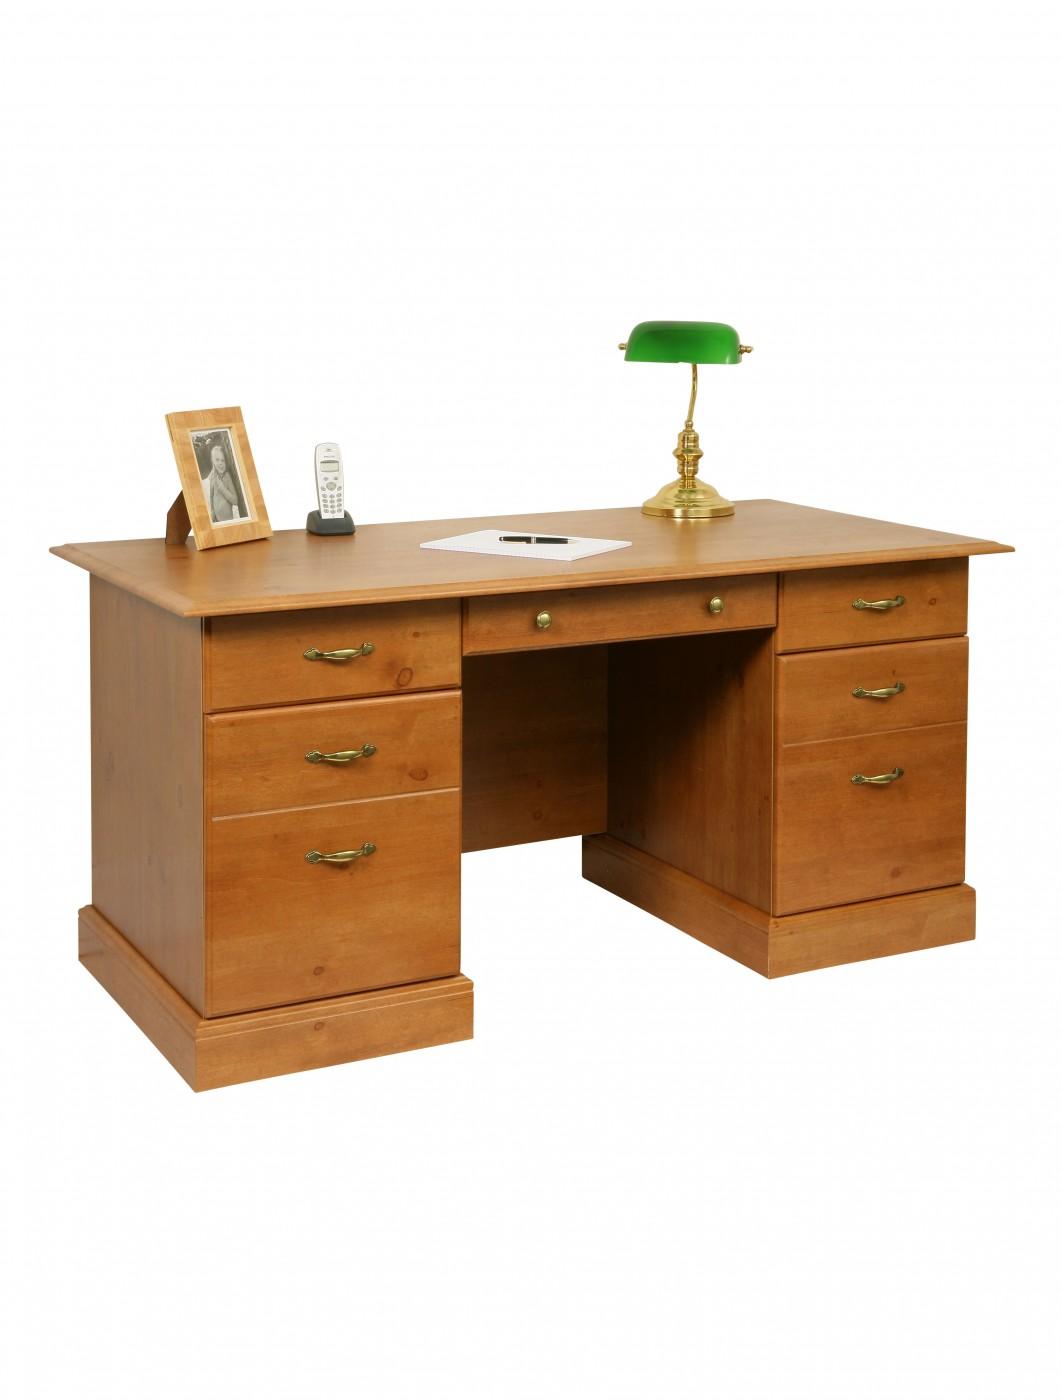 Cool S116 Modern Office Desk By JampM Furniture In Office Desks  Office